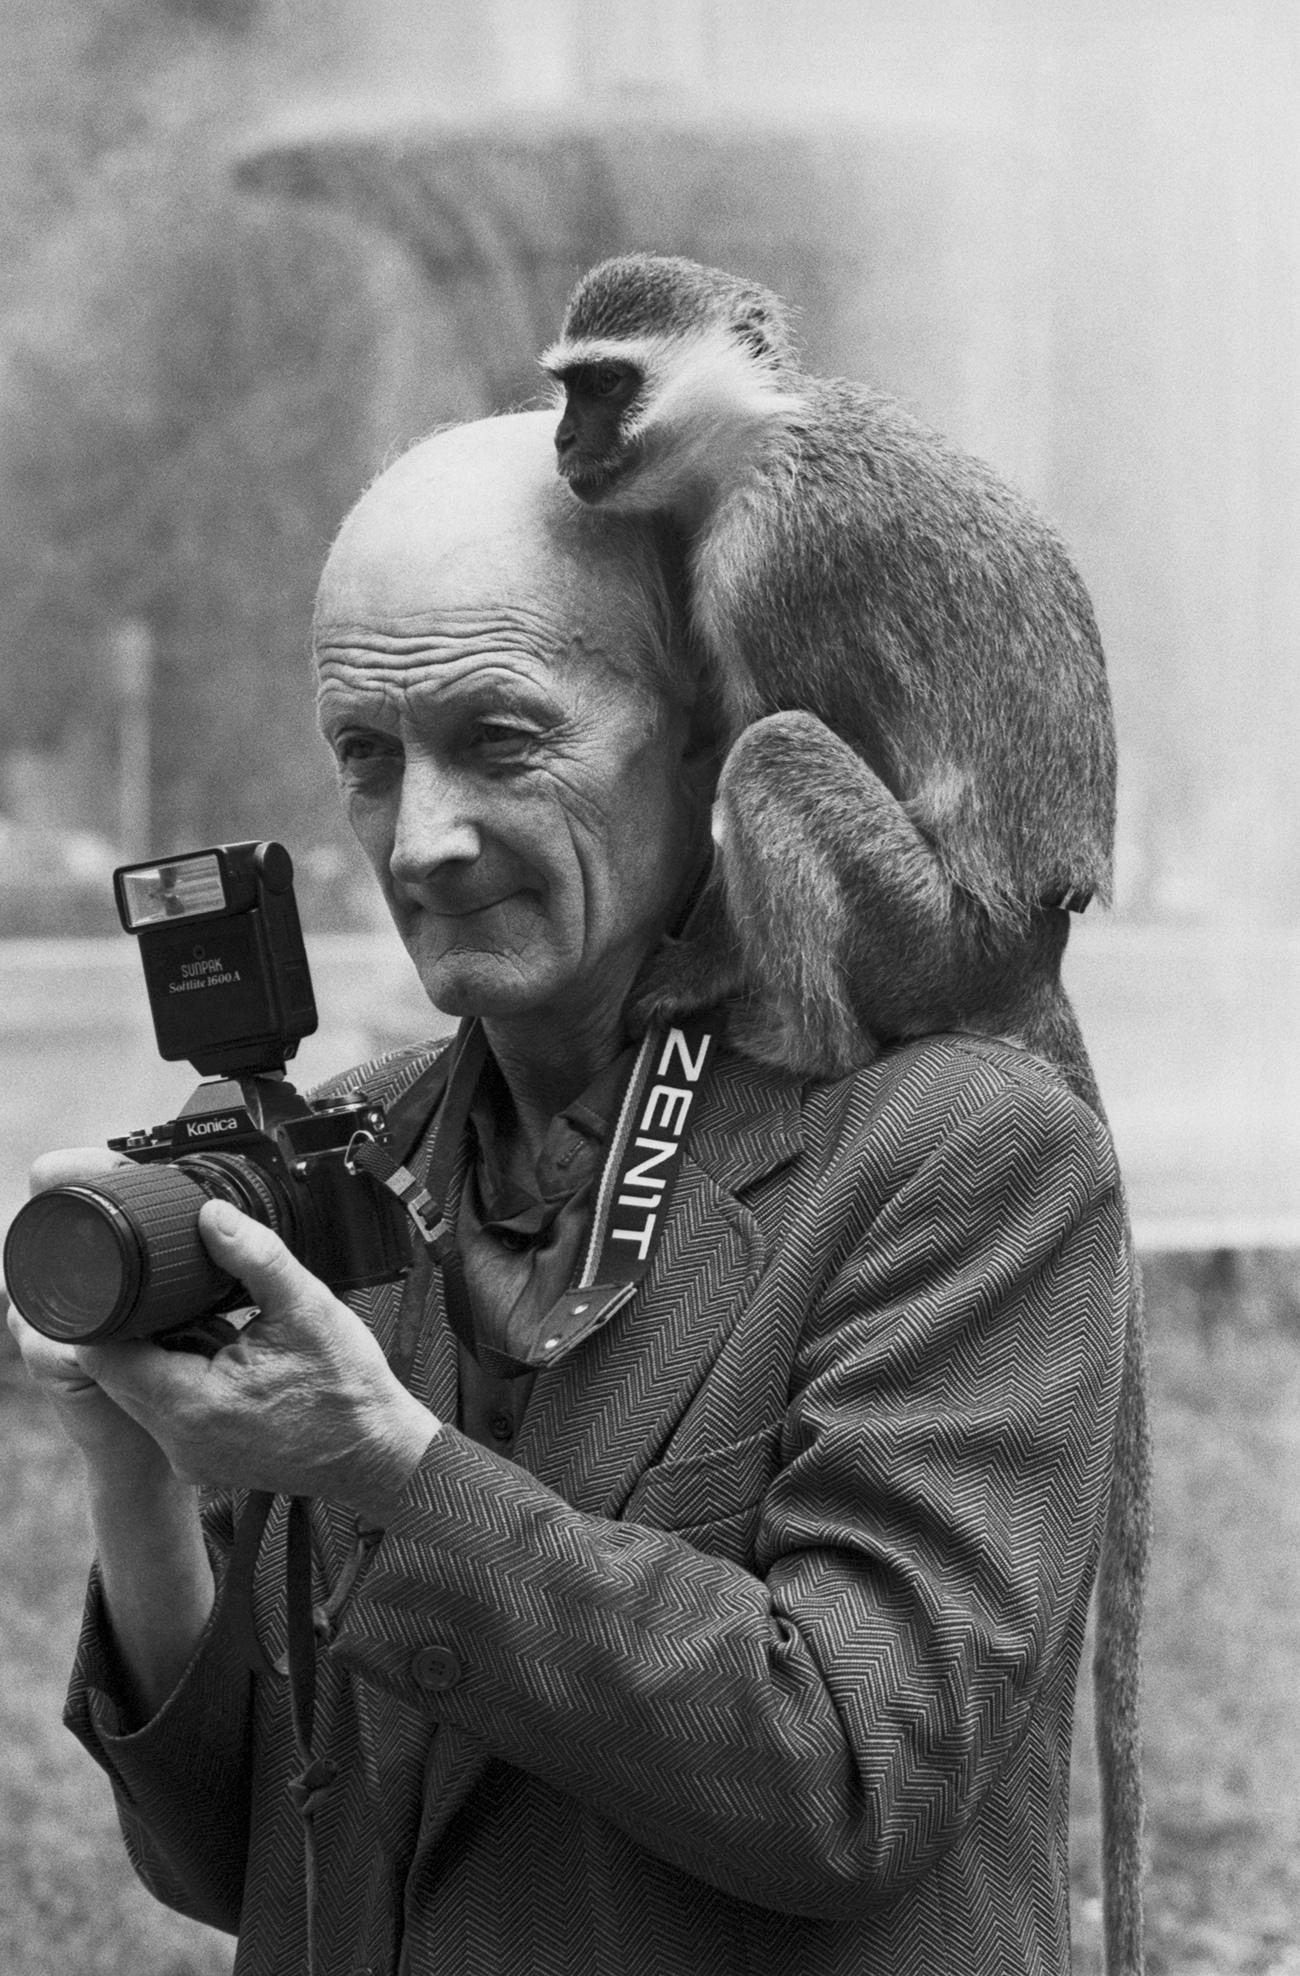 Zenit se proslavio tek pojavom Zenita-E 1965. godine, pripadnika sedme generacije ovih fotoaparata.